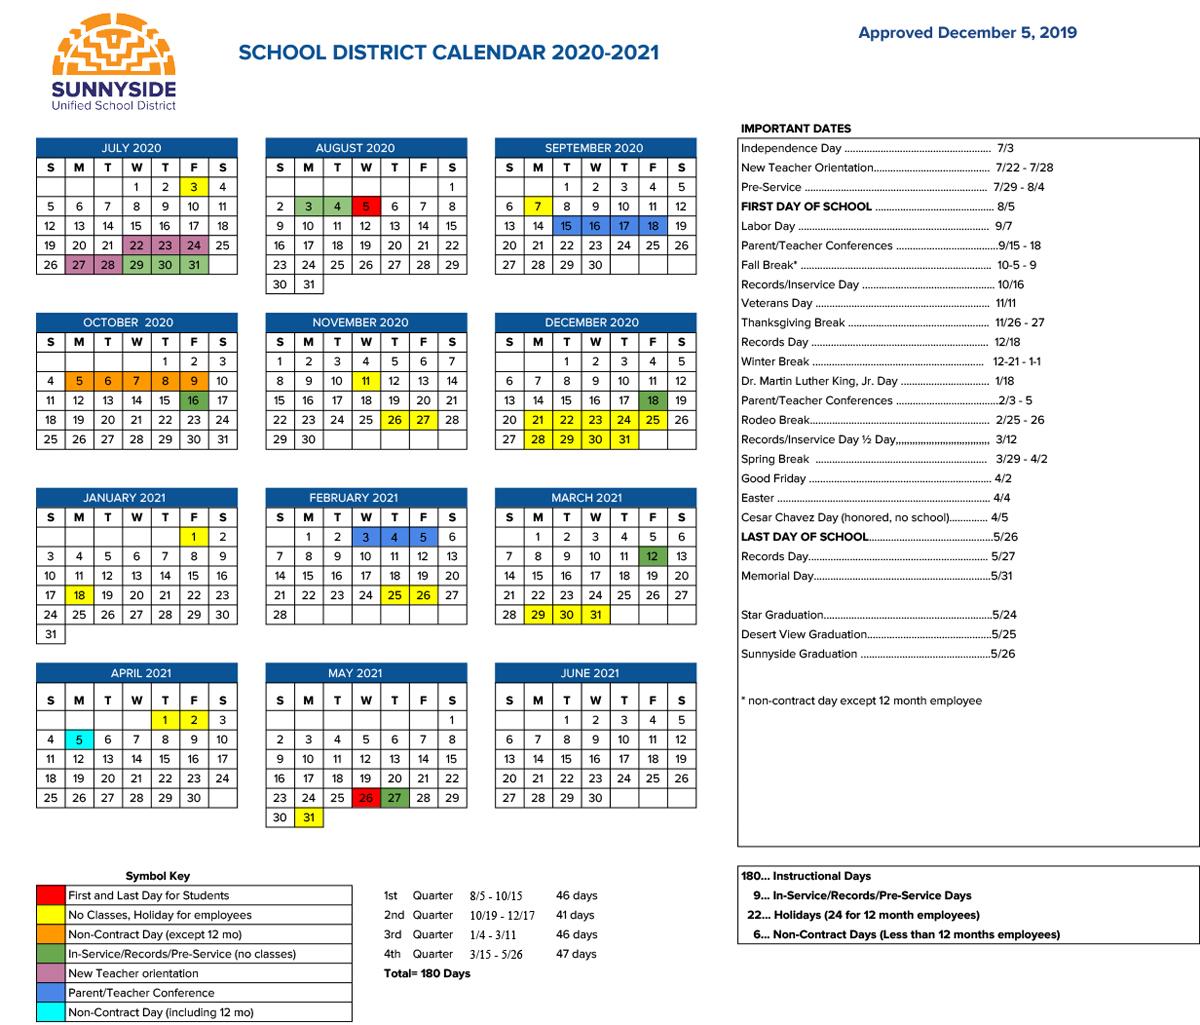 Academic Calendar | Sunnyside Unified School District With Santa Clara University Calendar 2020 2021